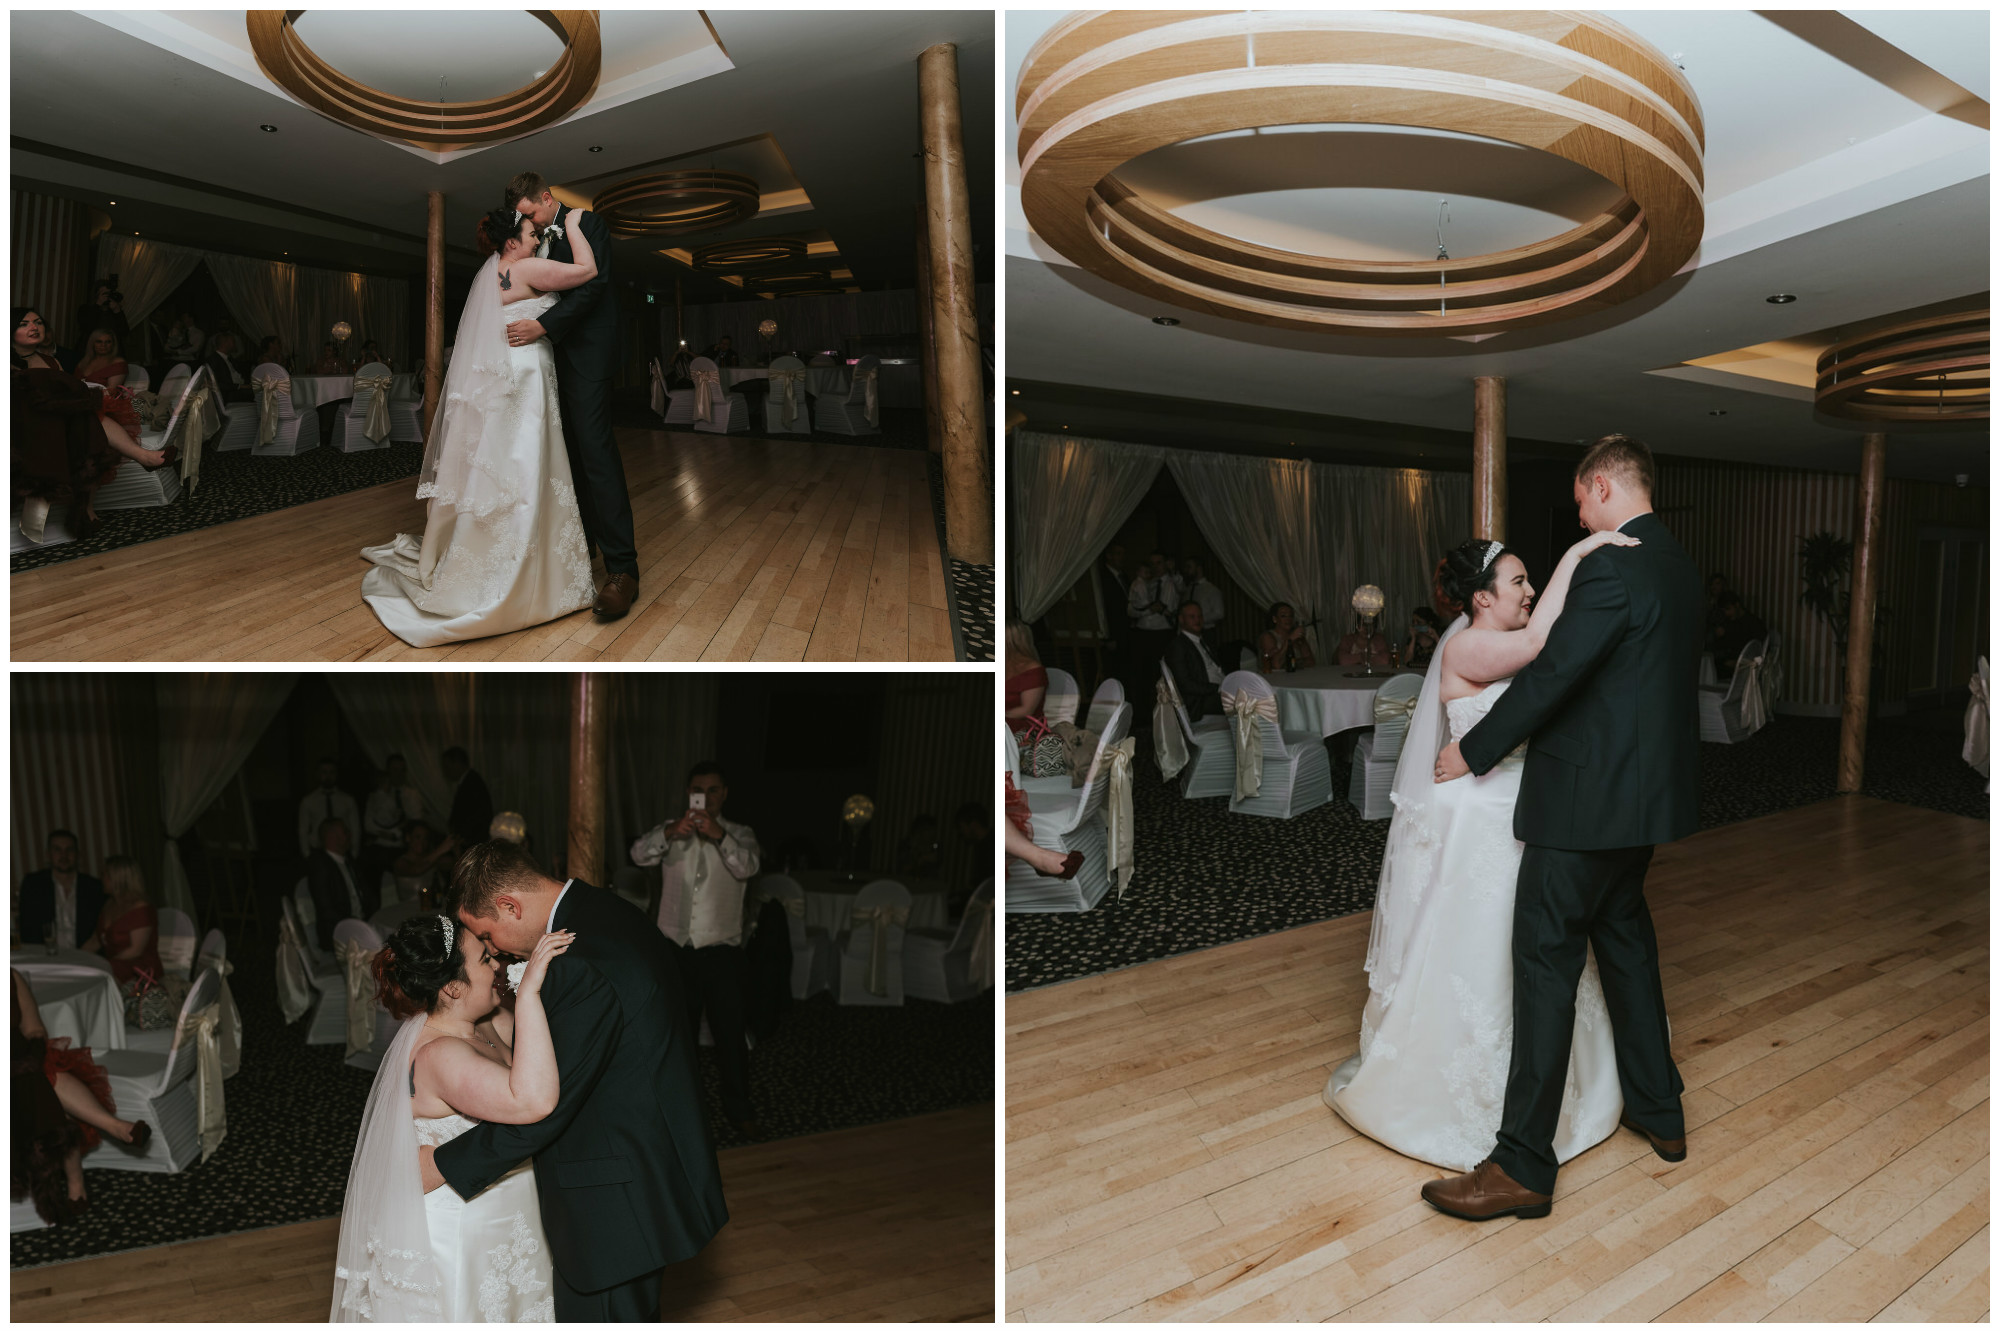 wedding photographer belfast ten square hotel bride and groom first dance